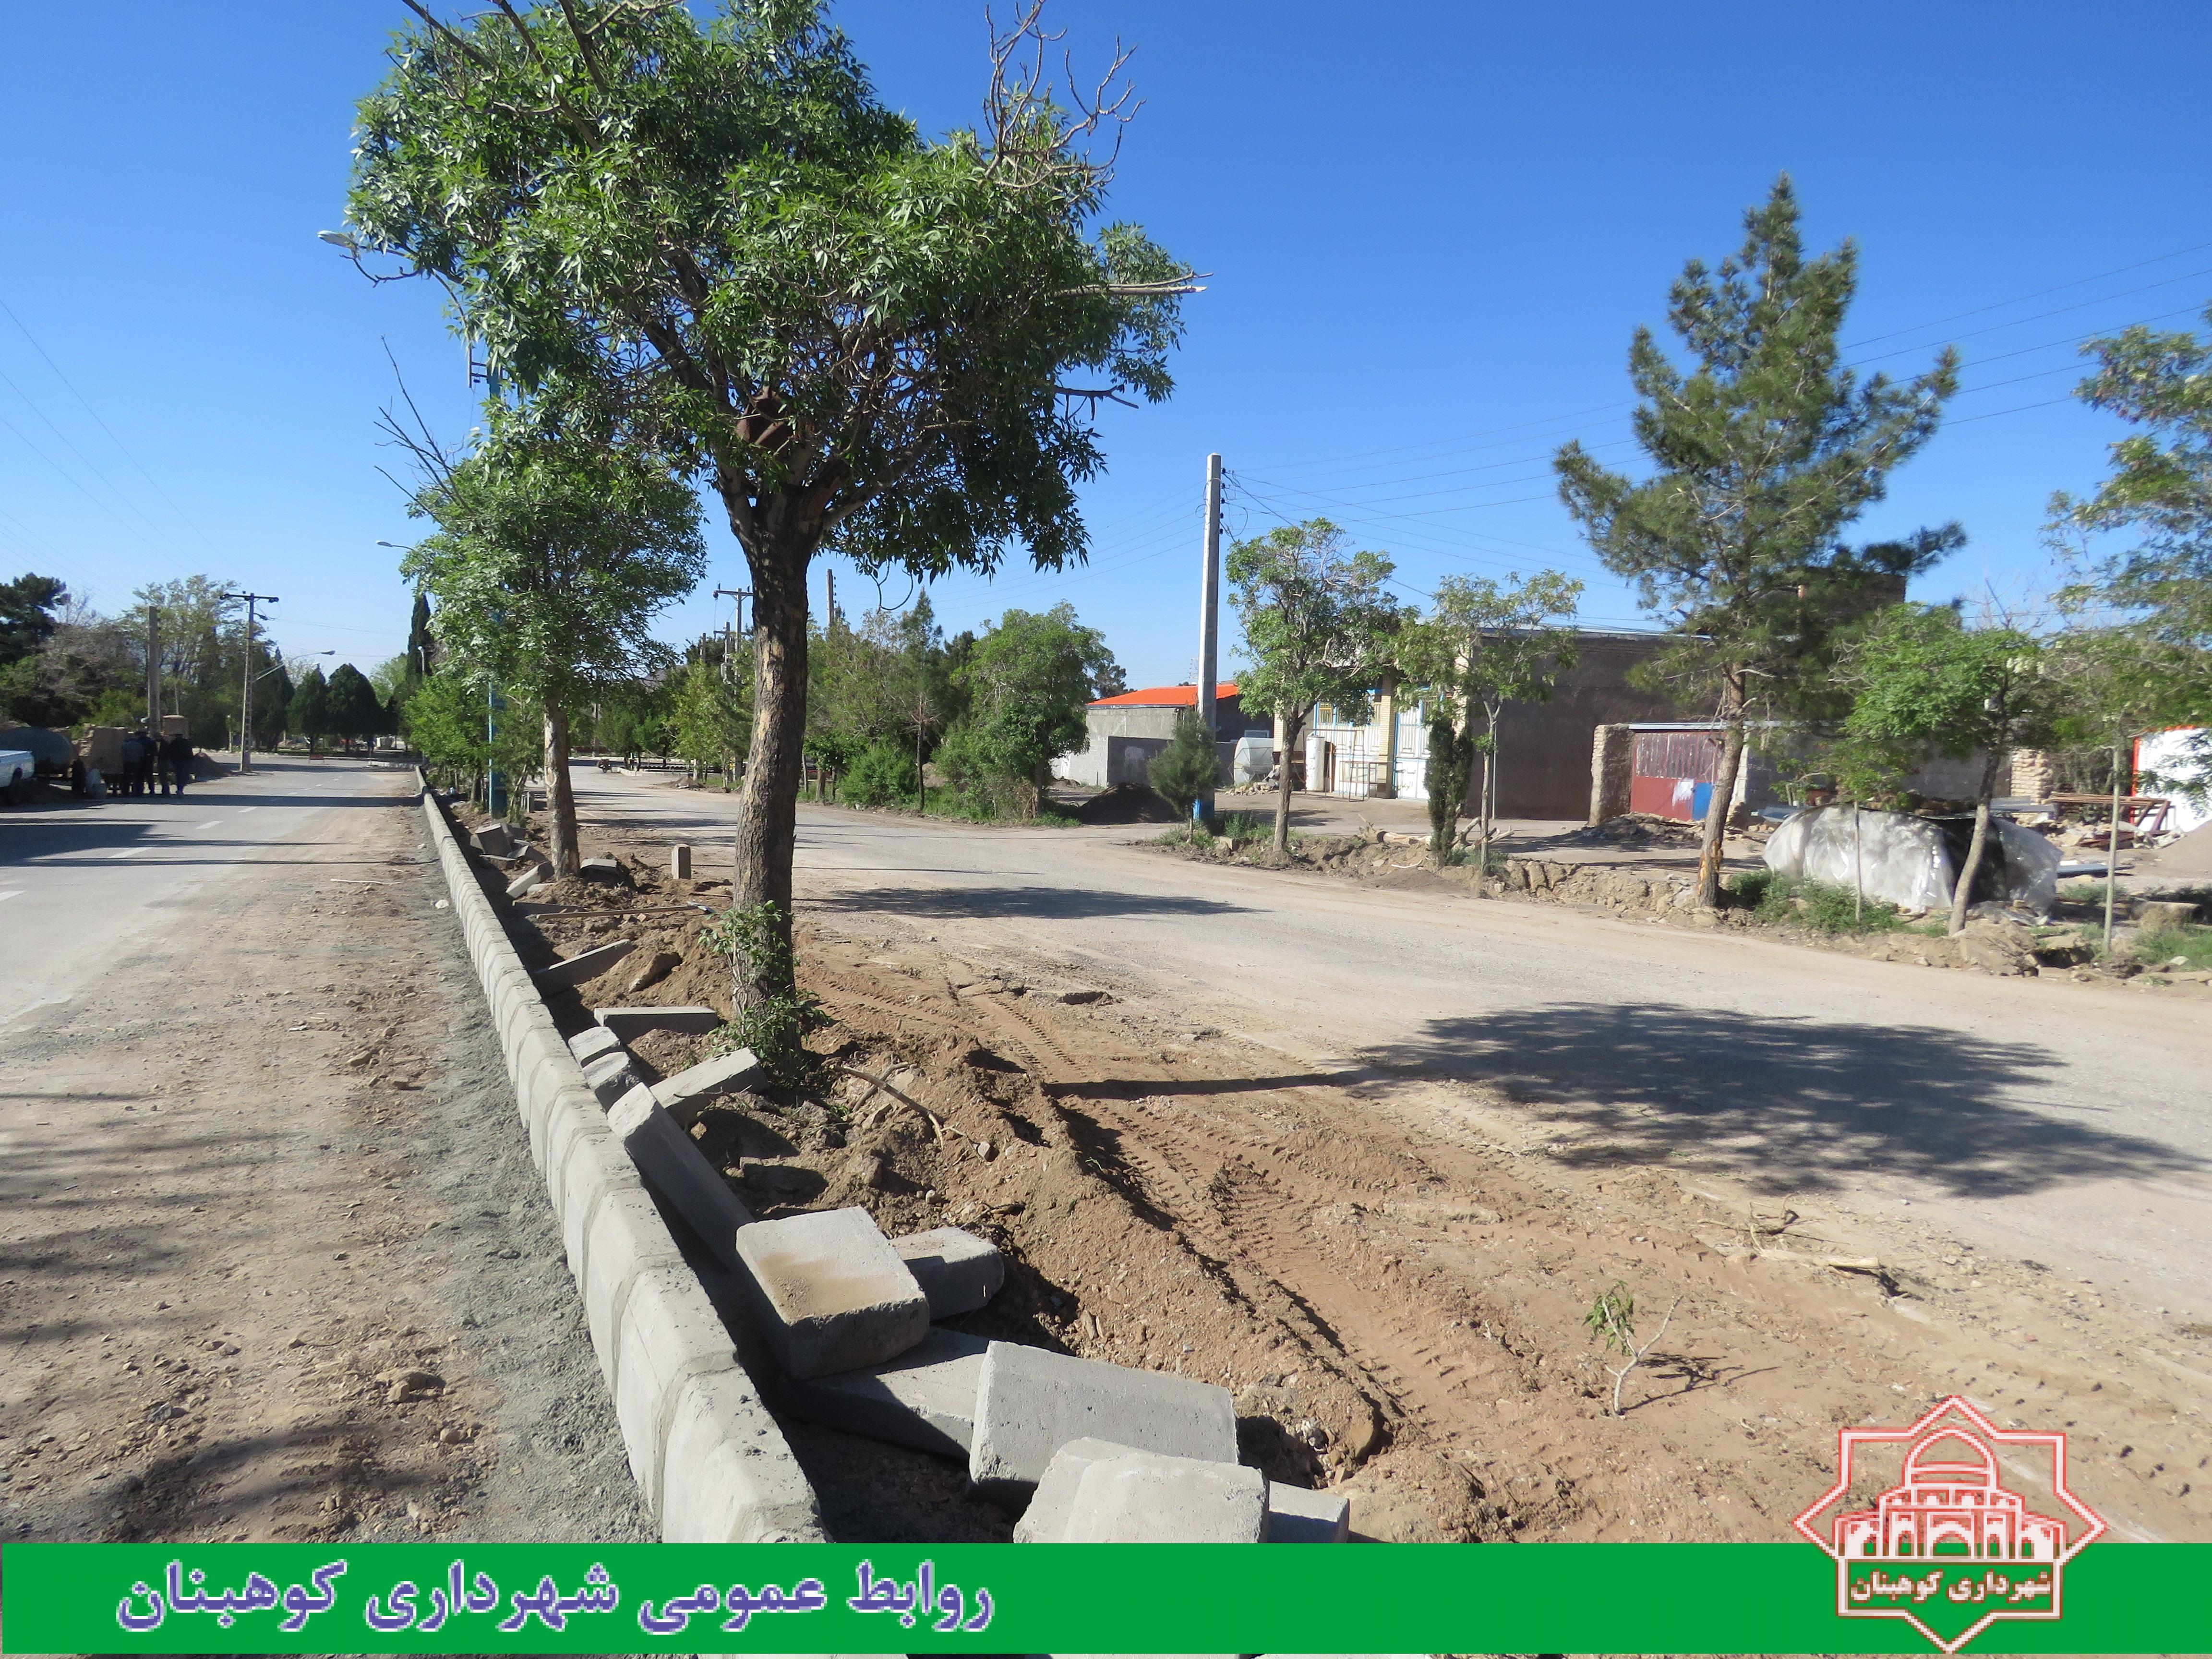 اجرای عملیات تعویض جداول بلوار عصمتیه